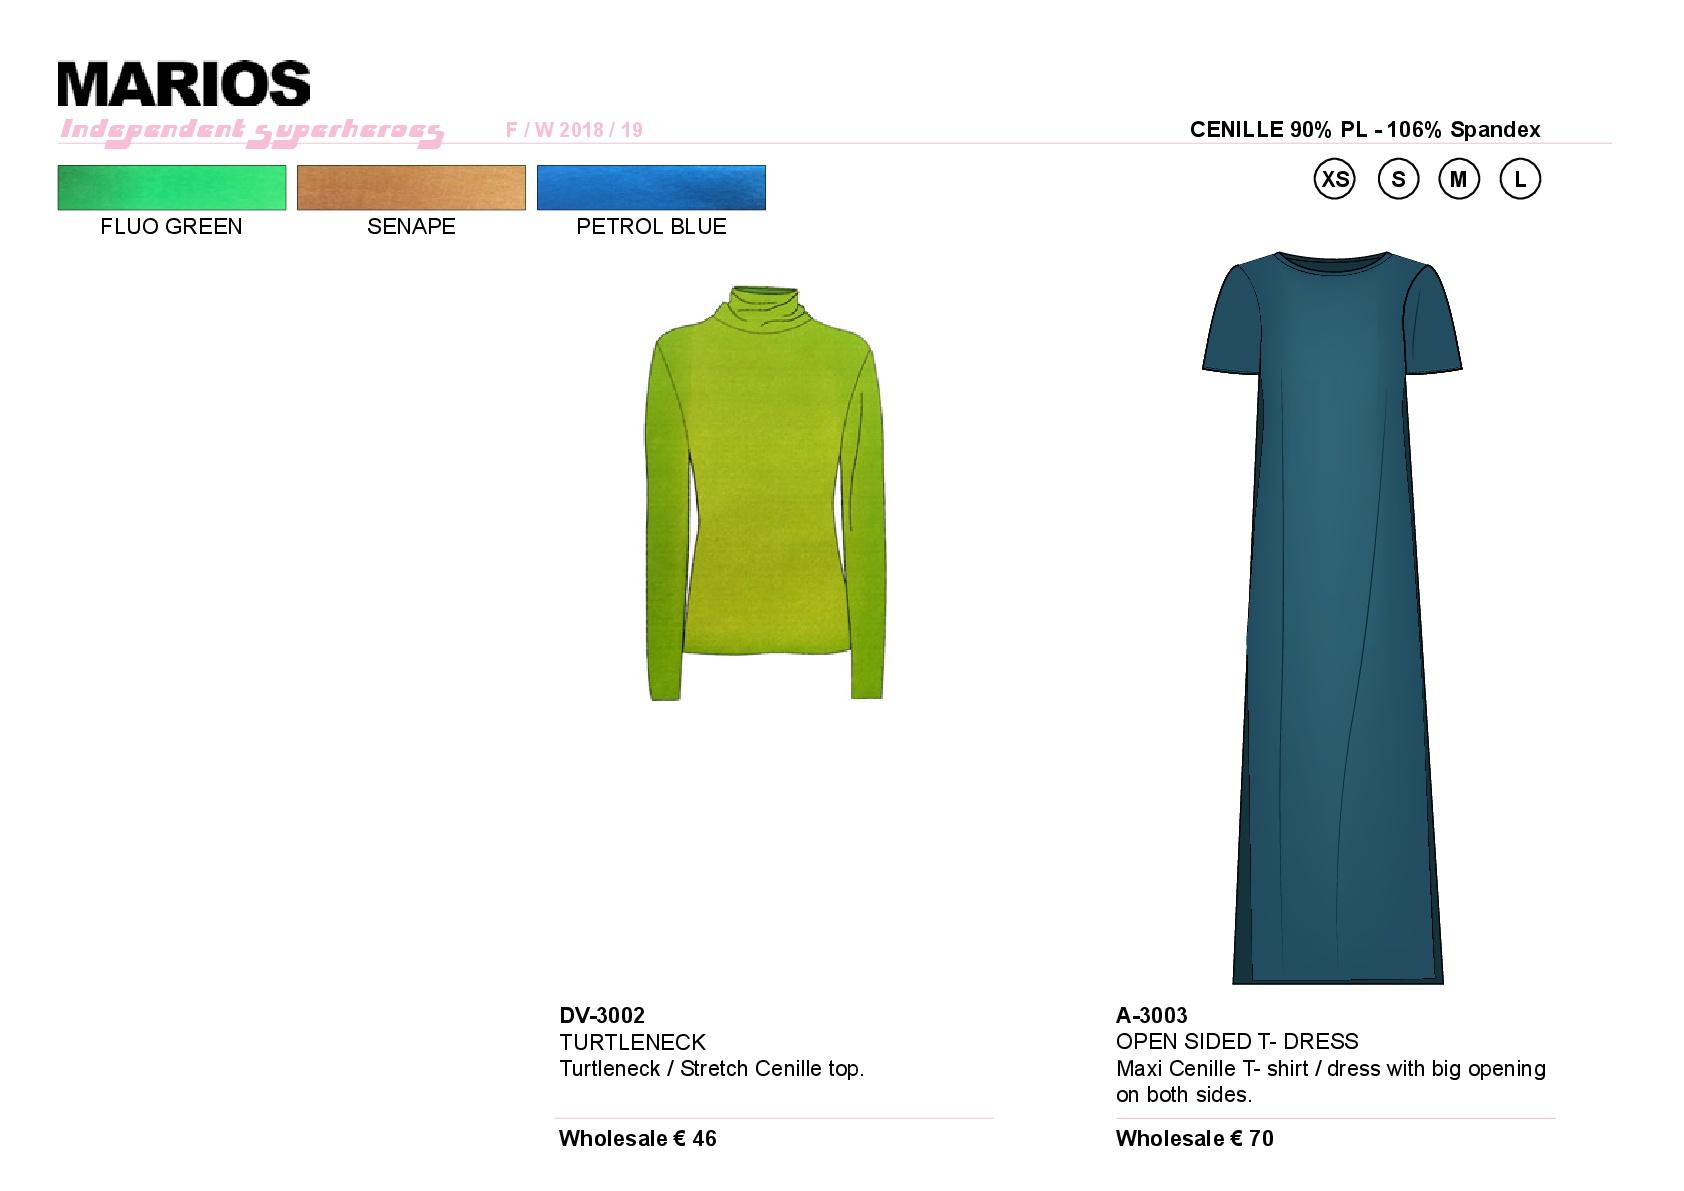 F_W-18-19-MARIOS-LINESHEET-indipendent-superheroes-wholesale-price-001-001.jpg